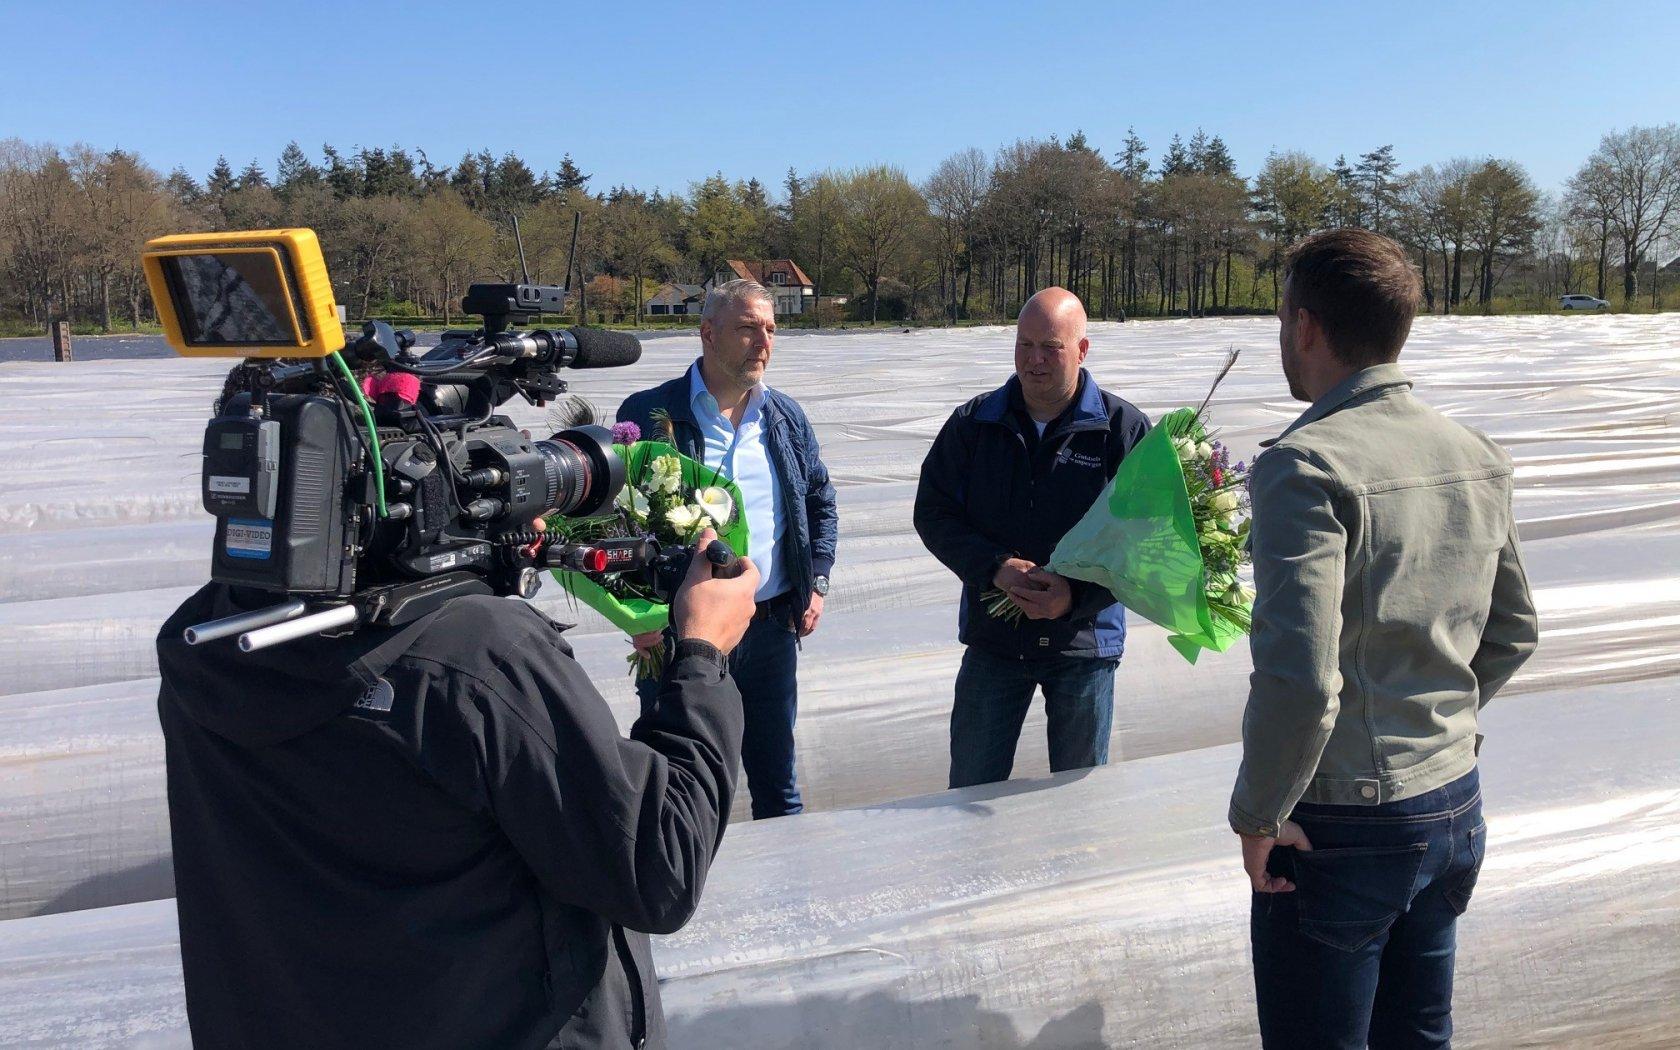 Hollandse asperge: van vollegrond tot supermarkt